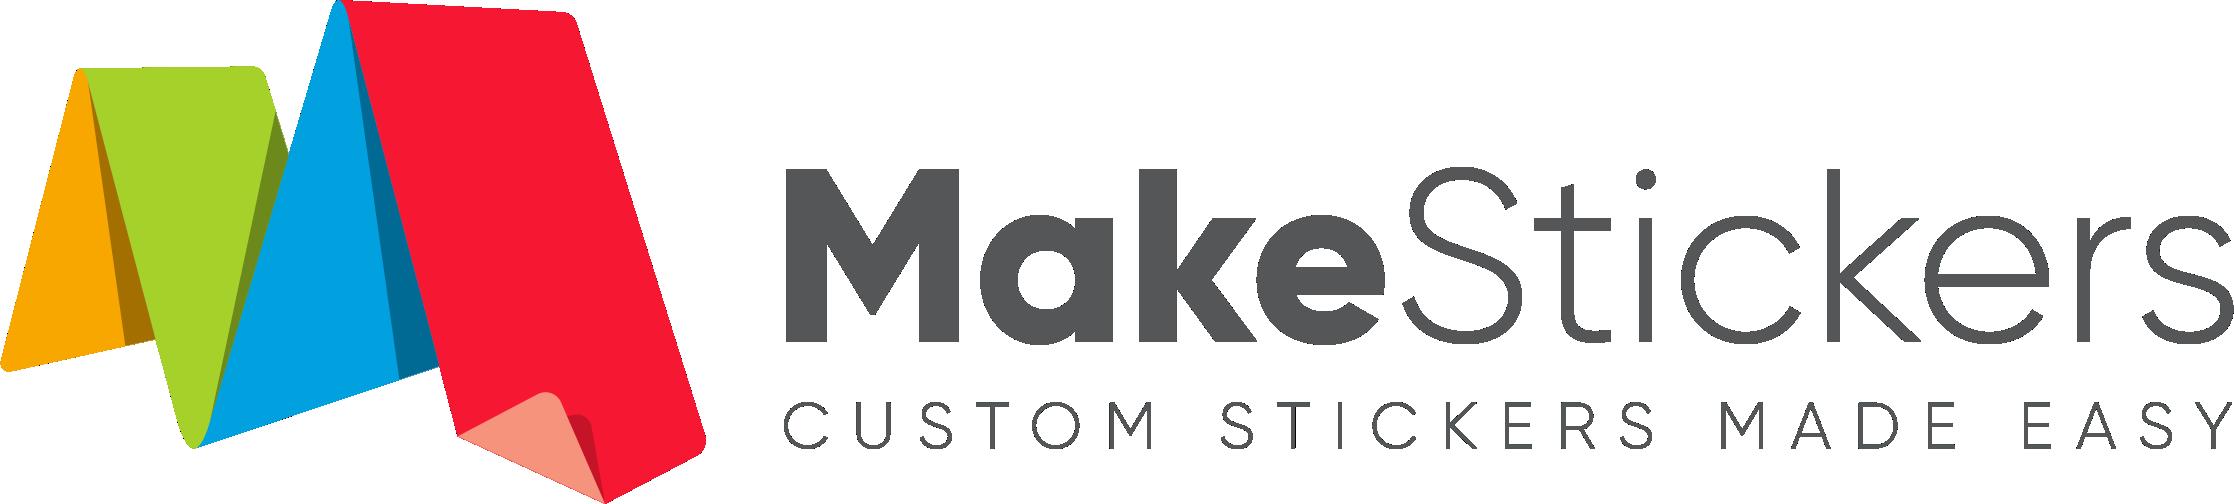 MakeStickers | Silver Sponsor for WeishFest 2018